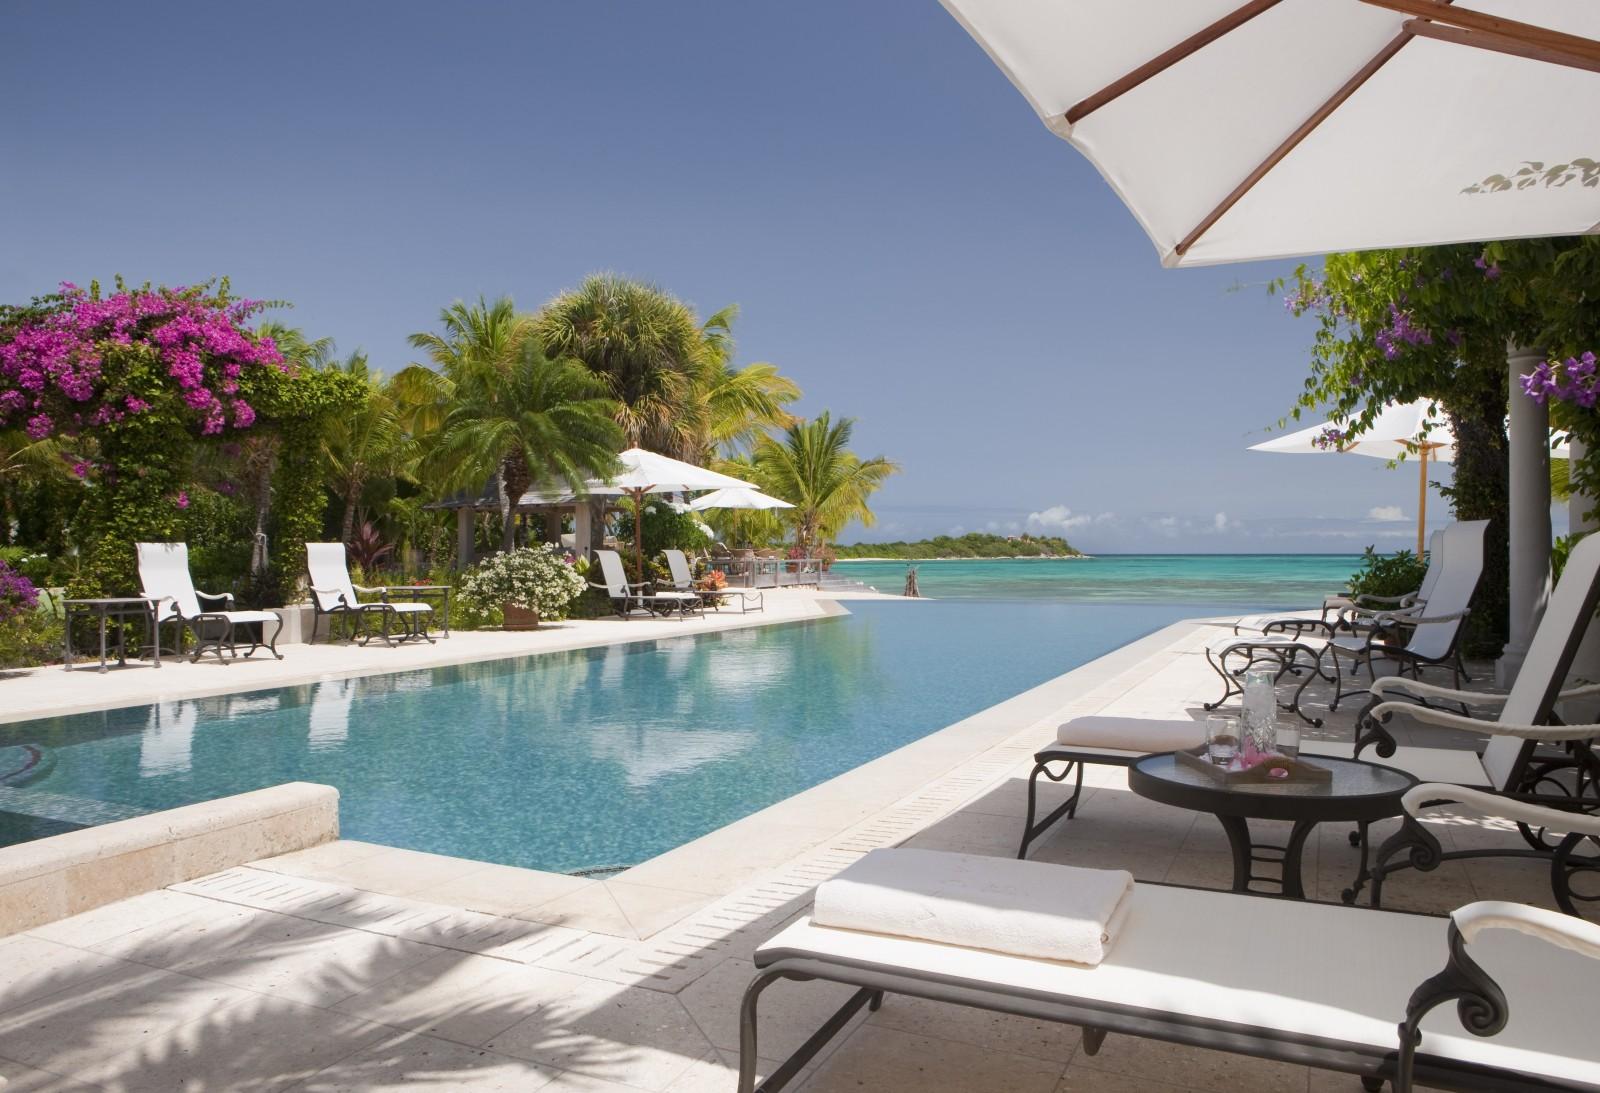 Antigua Hotels Jumby Bay image